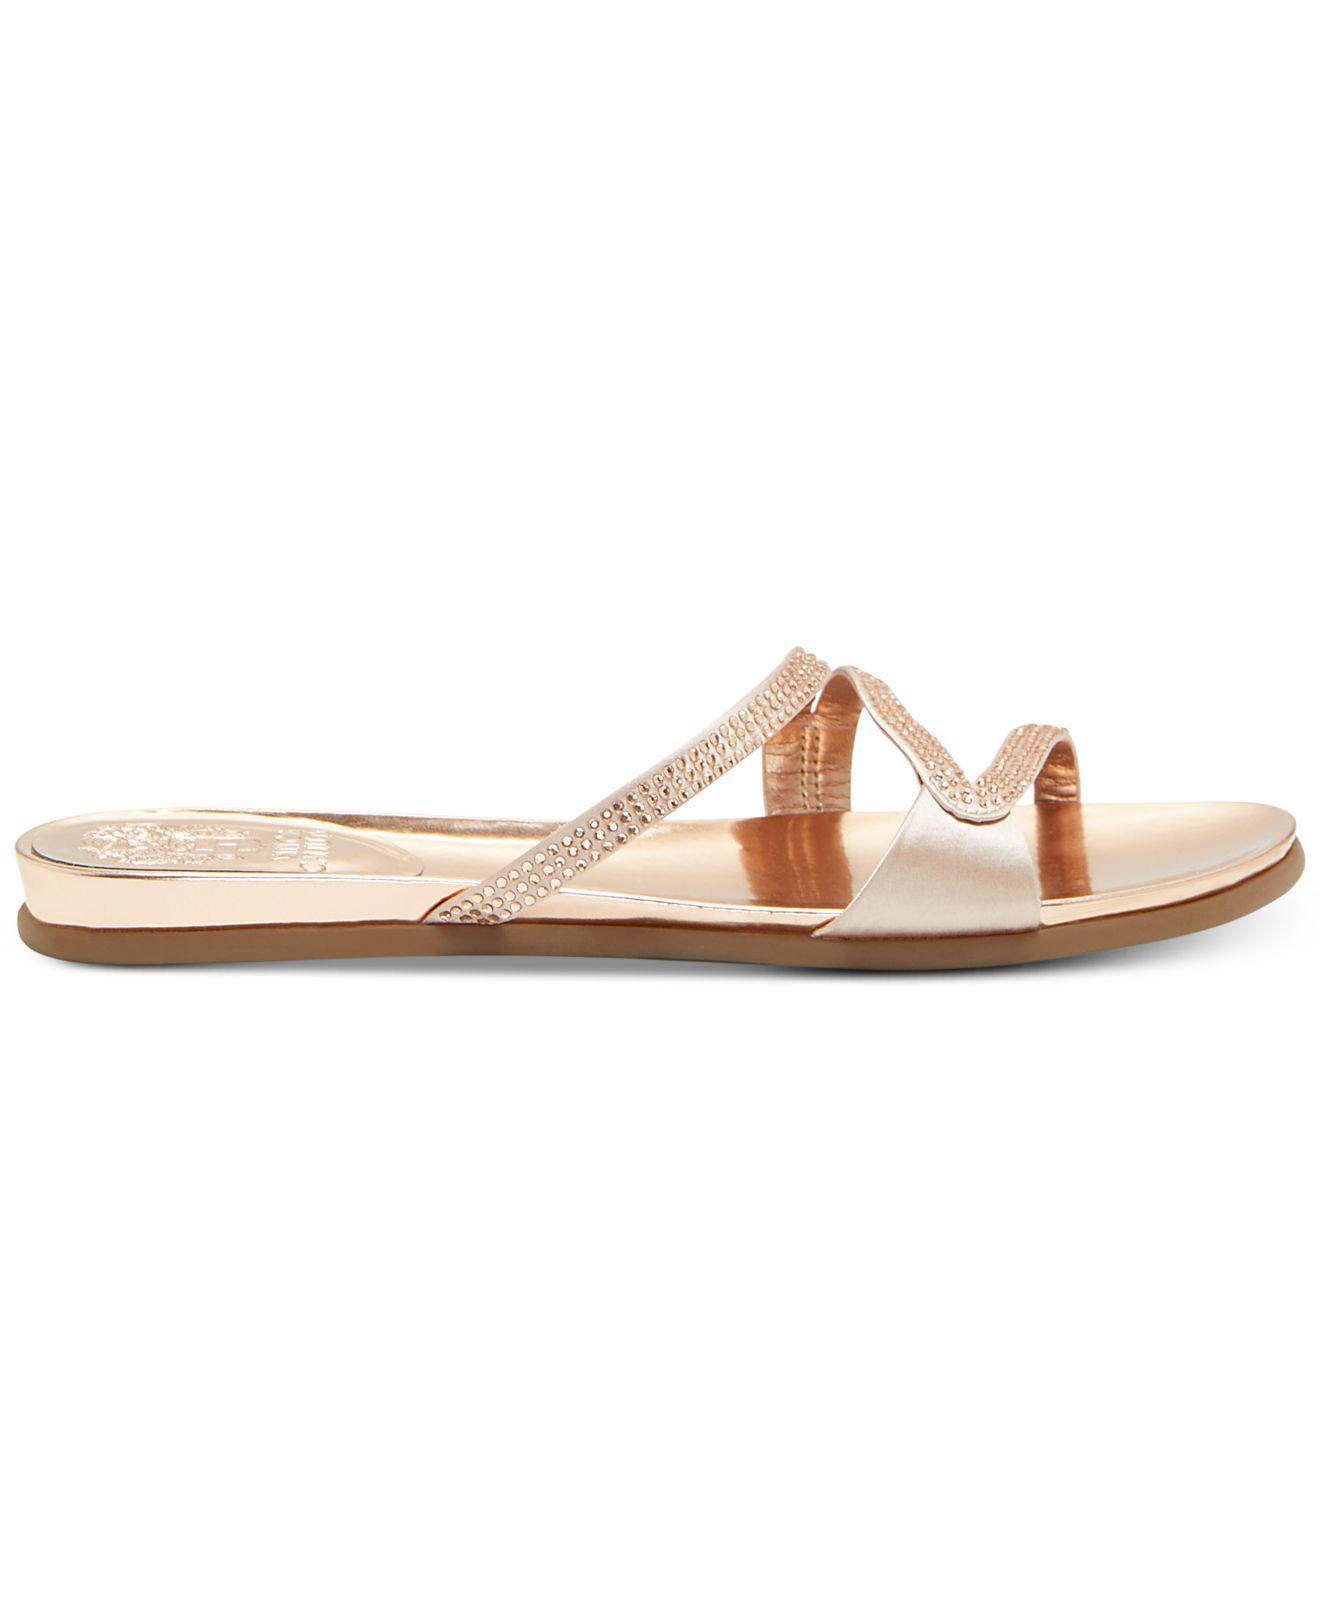 6505d8c4683 Lyst - Vince Camuto Elouisa Slide Sandals